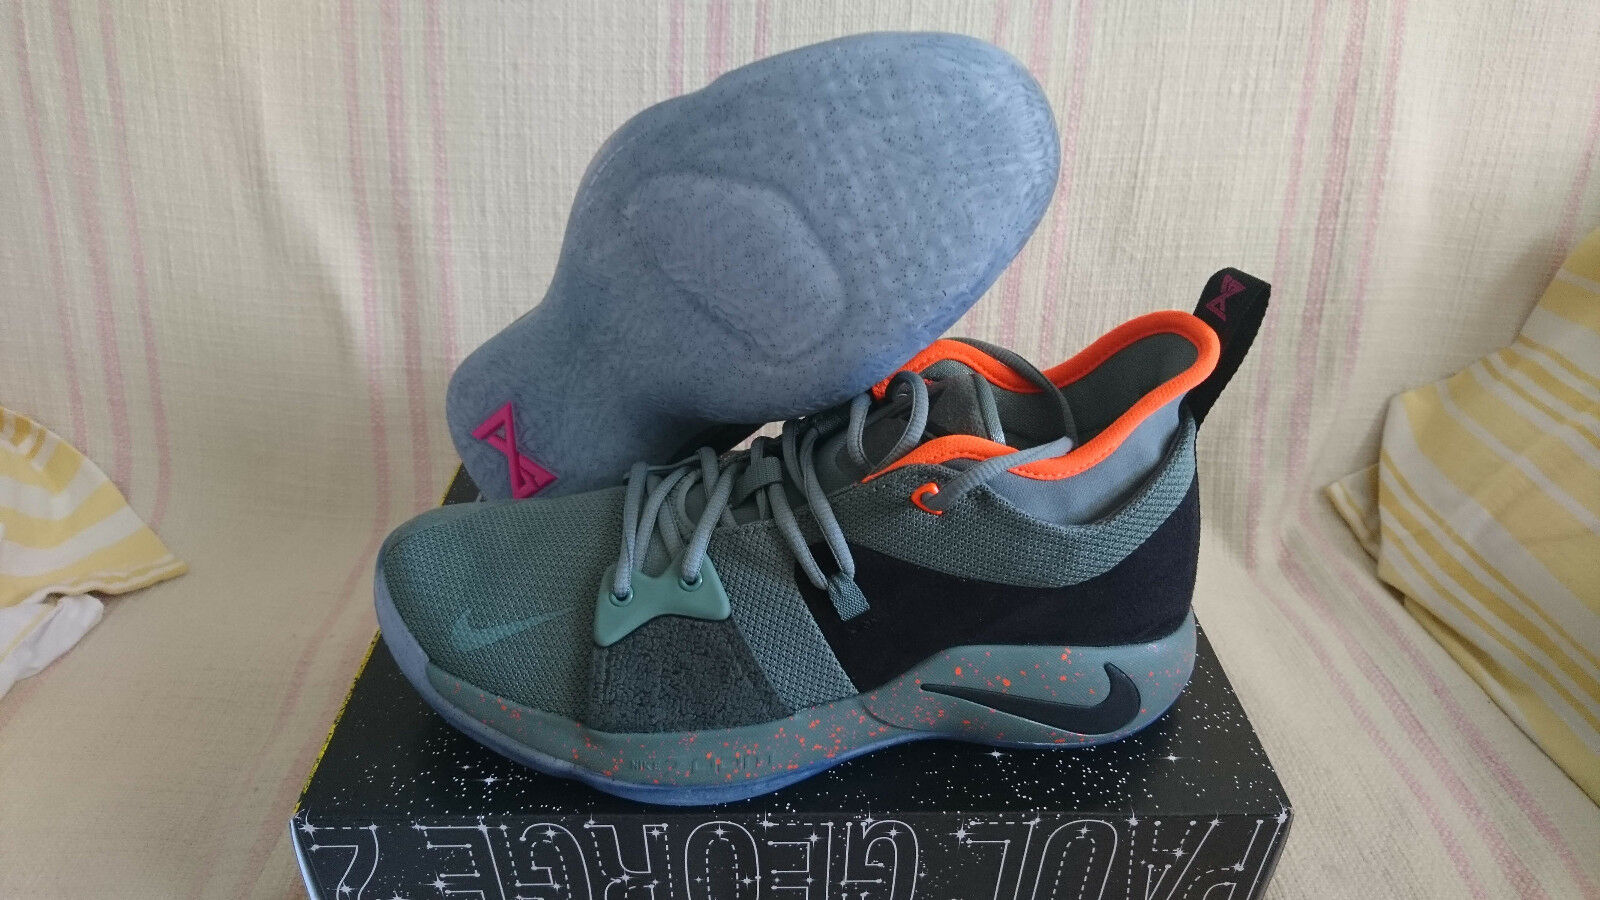 Nike PG 2 Palmdale arcilla verde negro Paul confortables George Basketball ao1750 300 confortables Paul 45e8a0